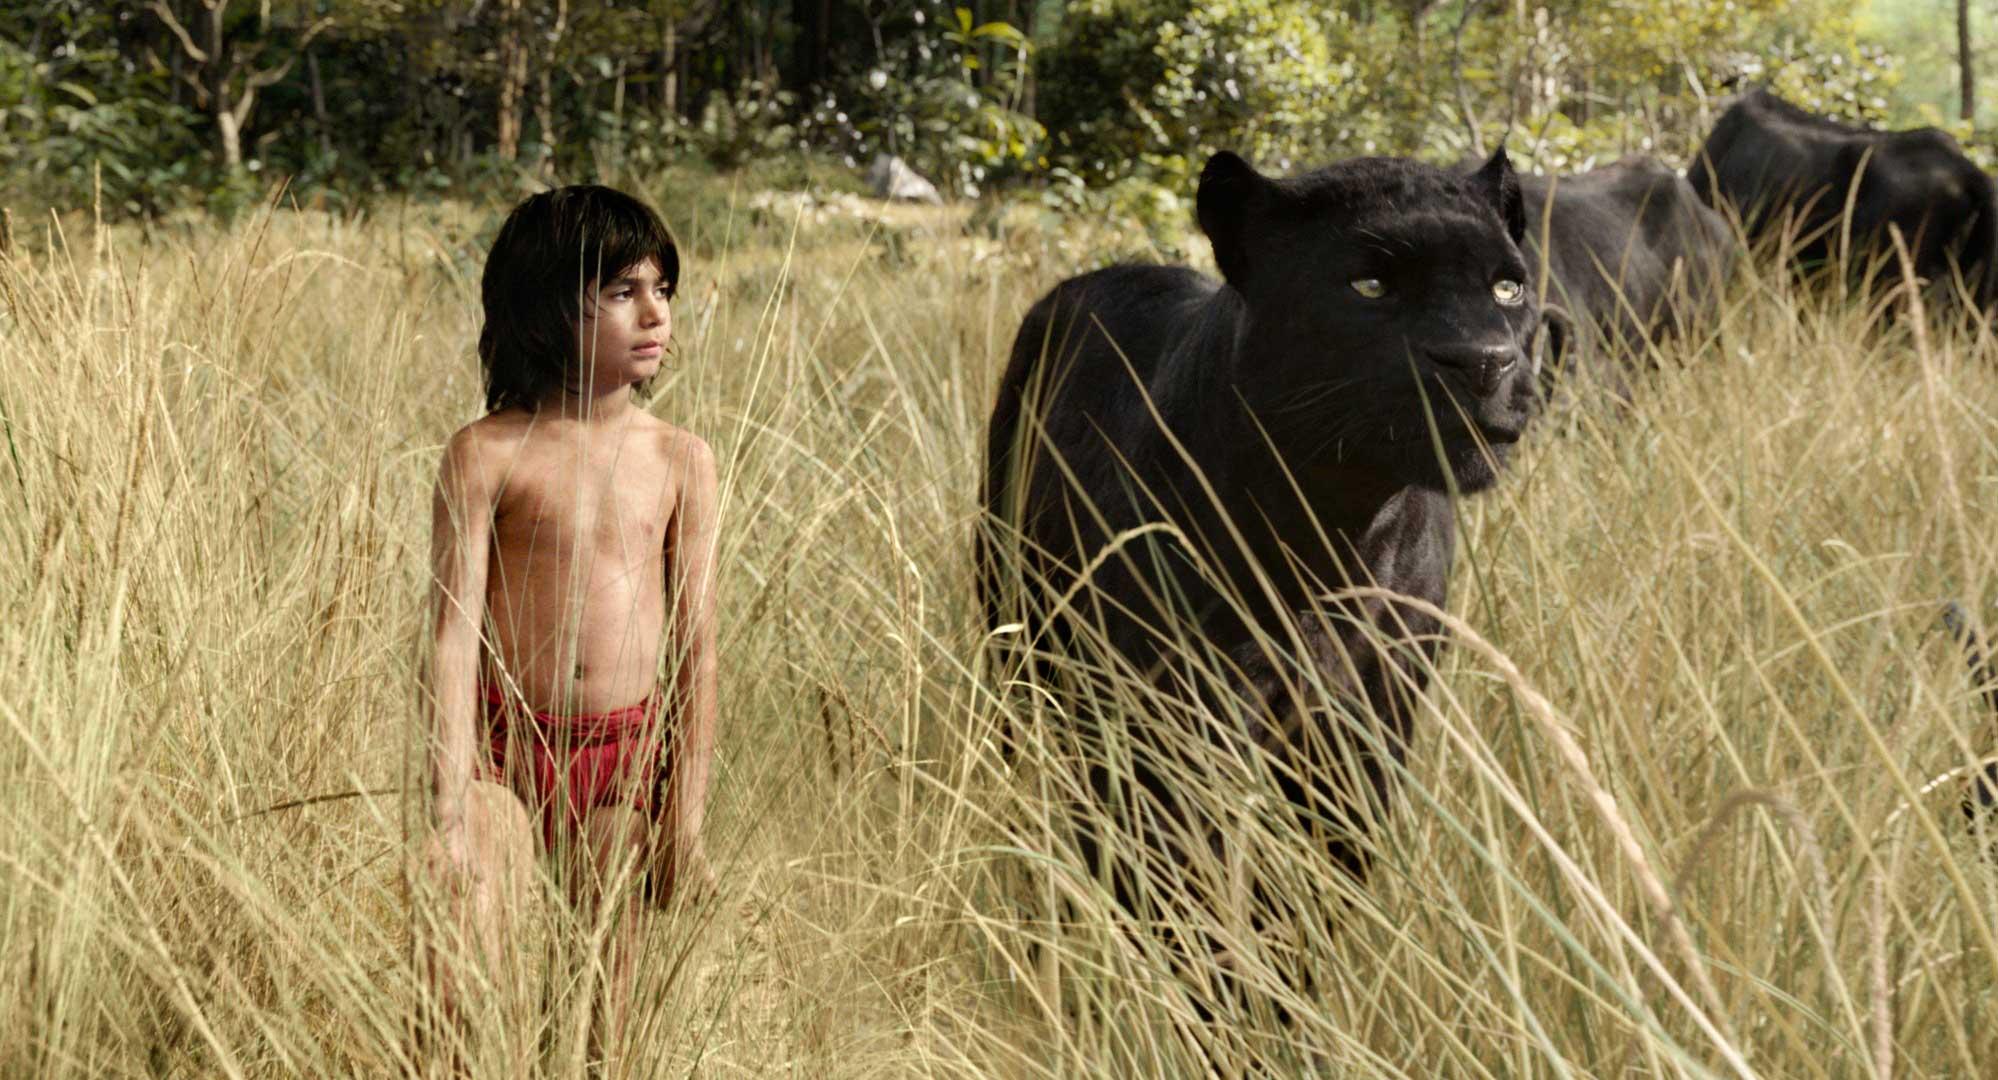 Jon Favreau's Jungle Book is a wild tale for a digital age